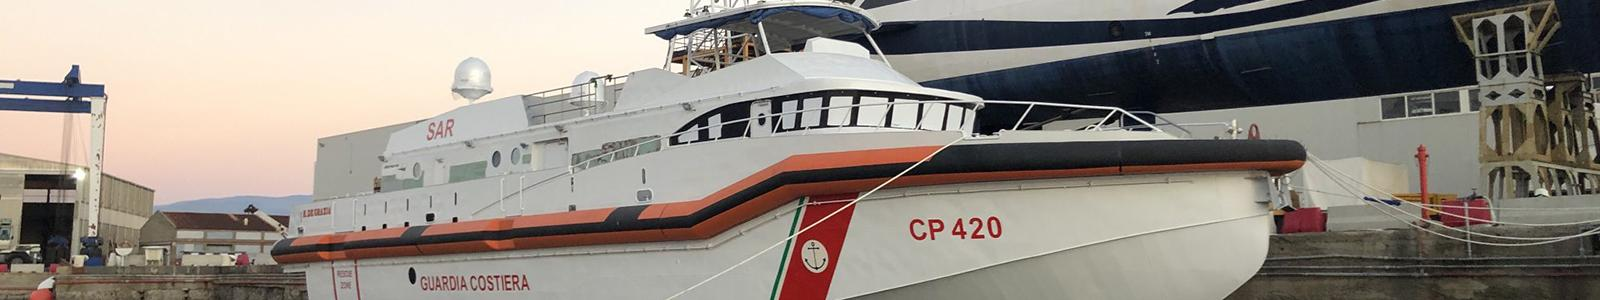 Guardia Costiera Genova CP420 SAR